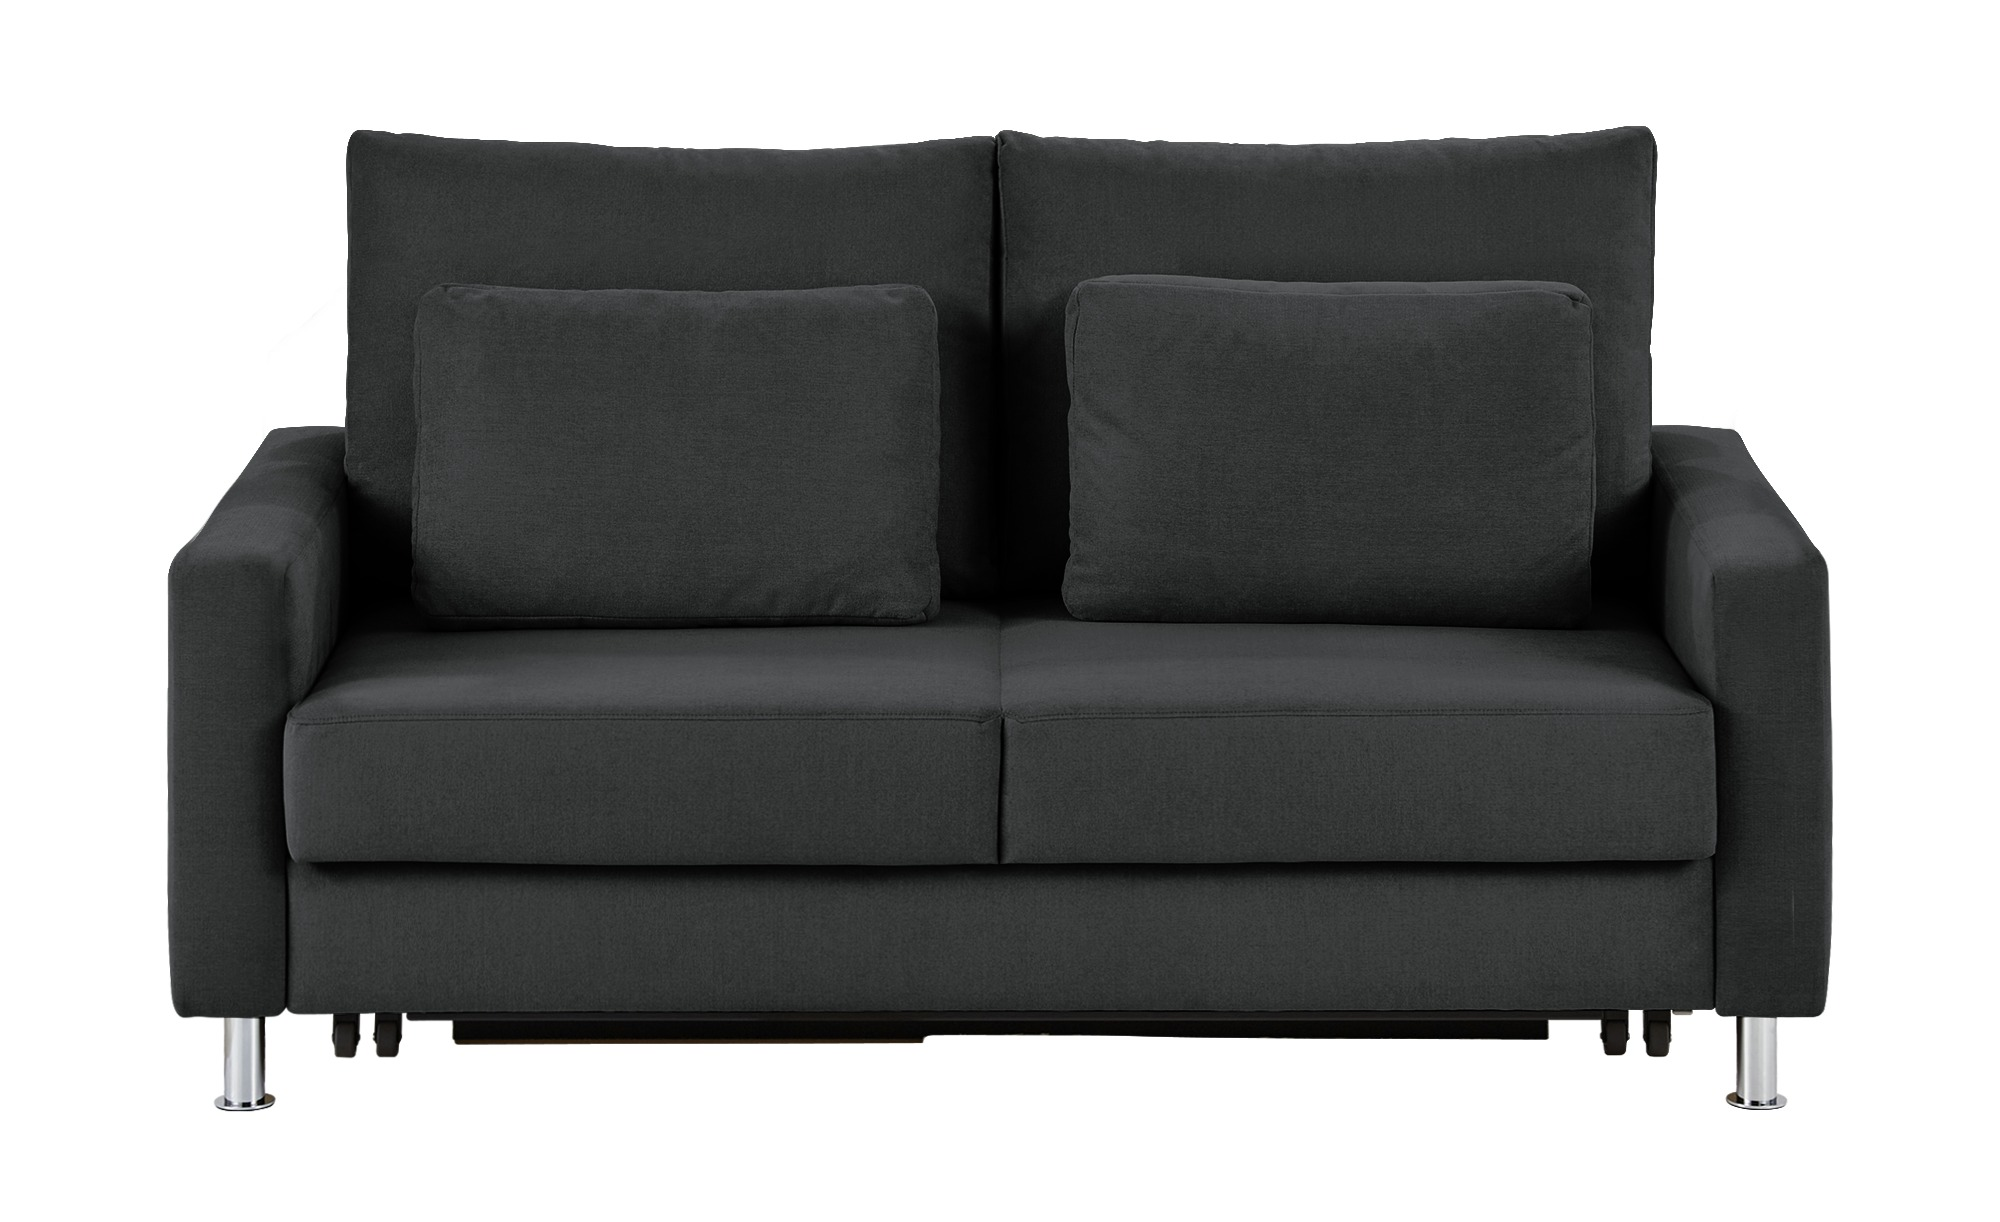 Schlafsofa grau - Mikrofaser Fürth ¦ grau ¦ Maße (cm): B: 146 H: 90 T: 95 Polstermöbel > Sofas > 2-Sitzer - Höffner